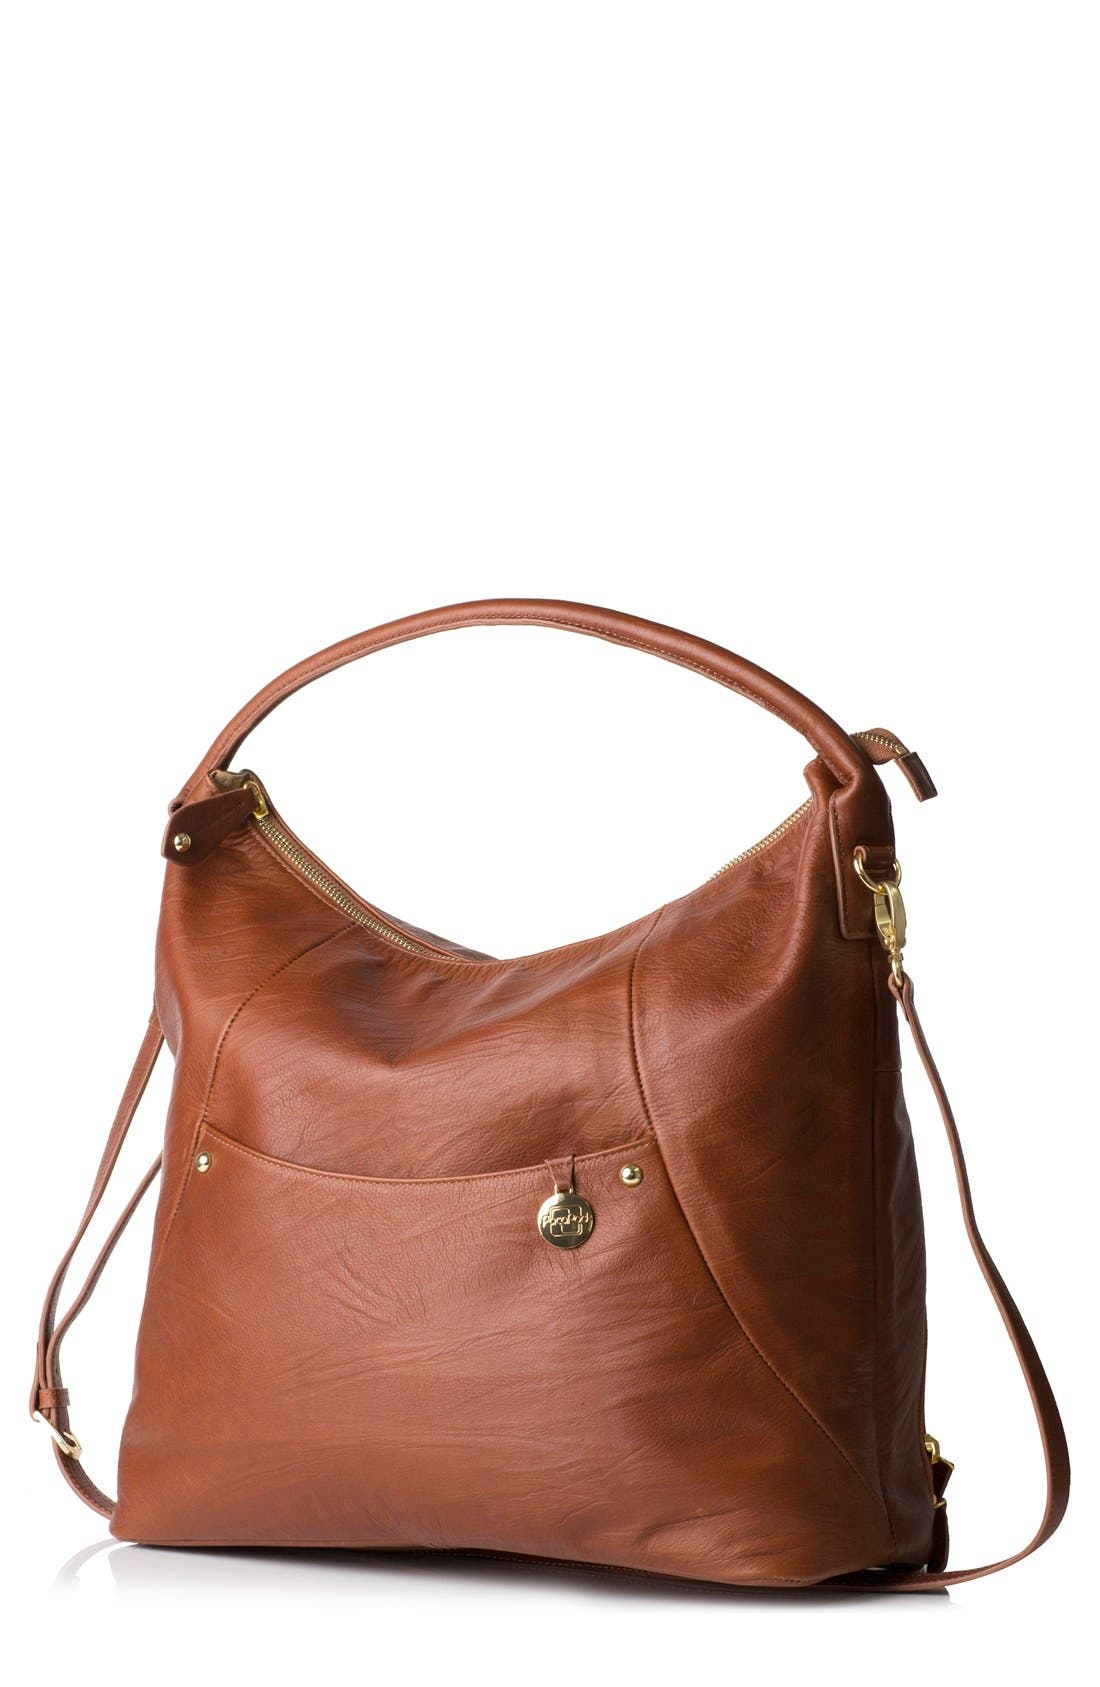 Alternate Image 1 Selected - PacaPod 'Jasper' Leather Diaper Bag